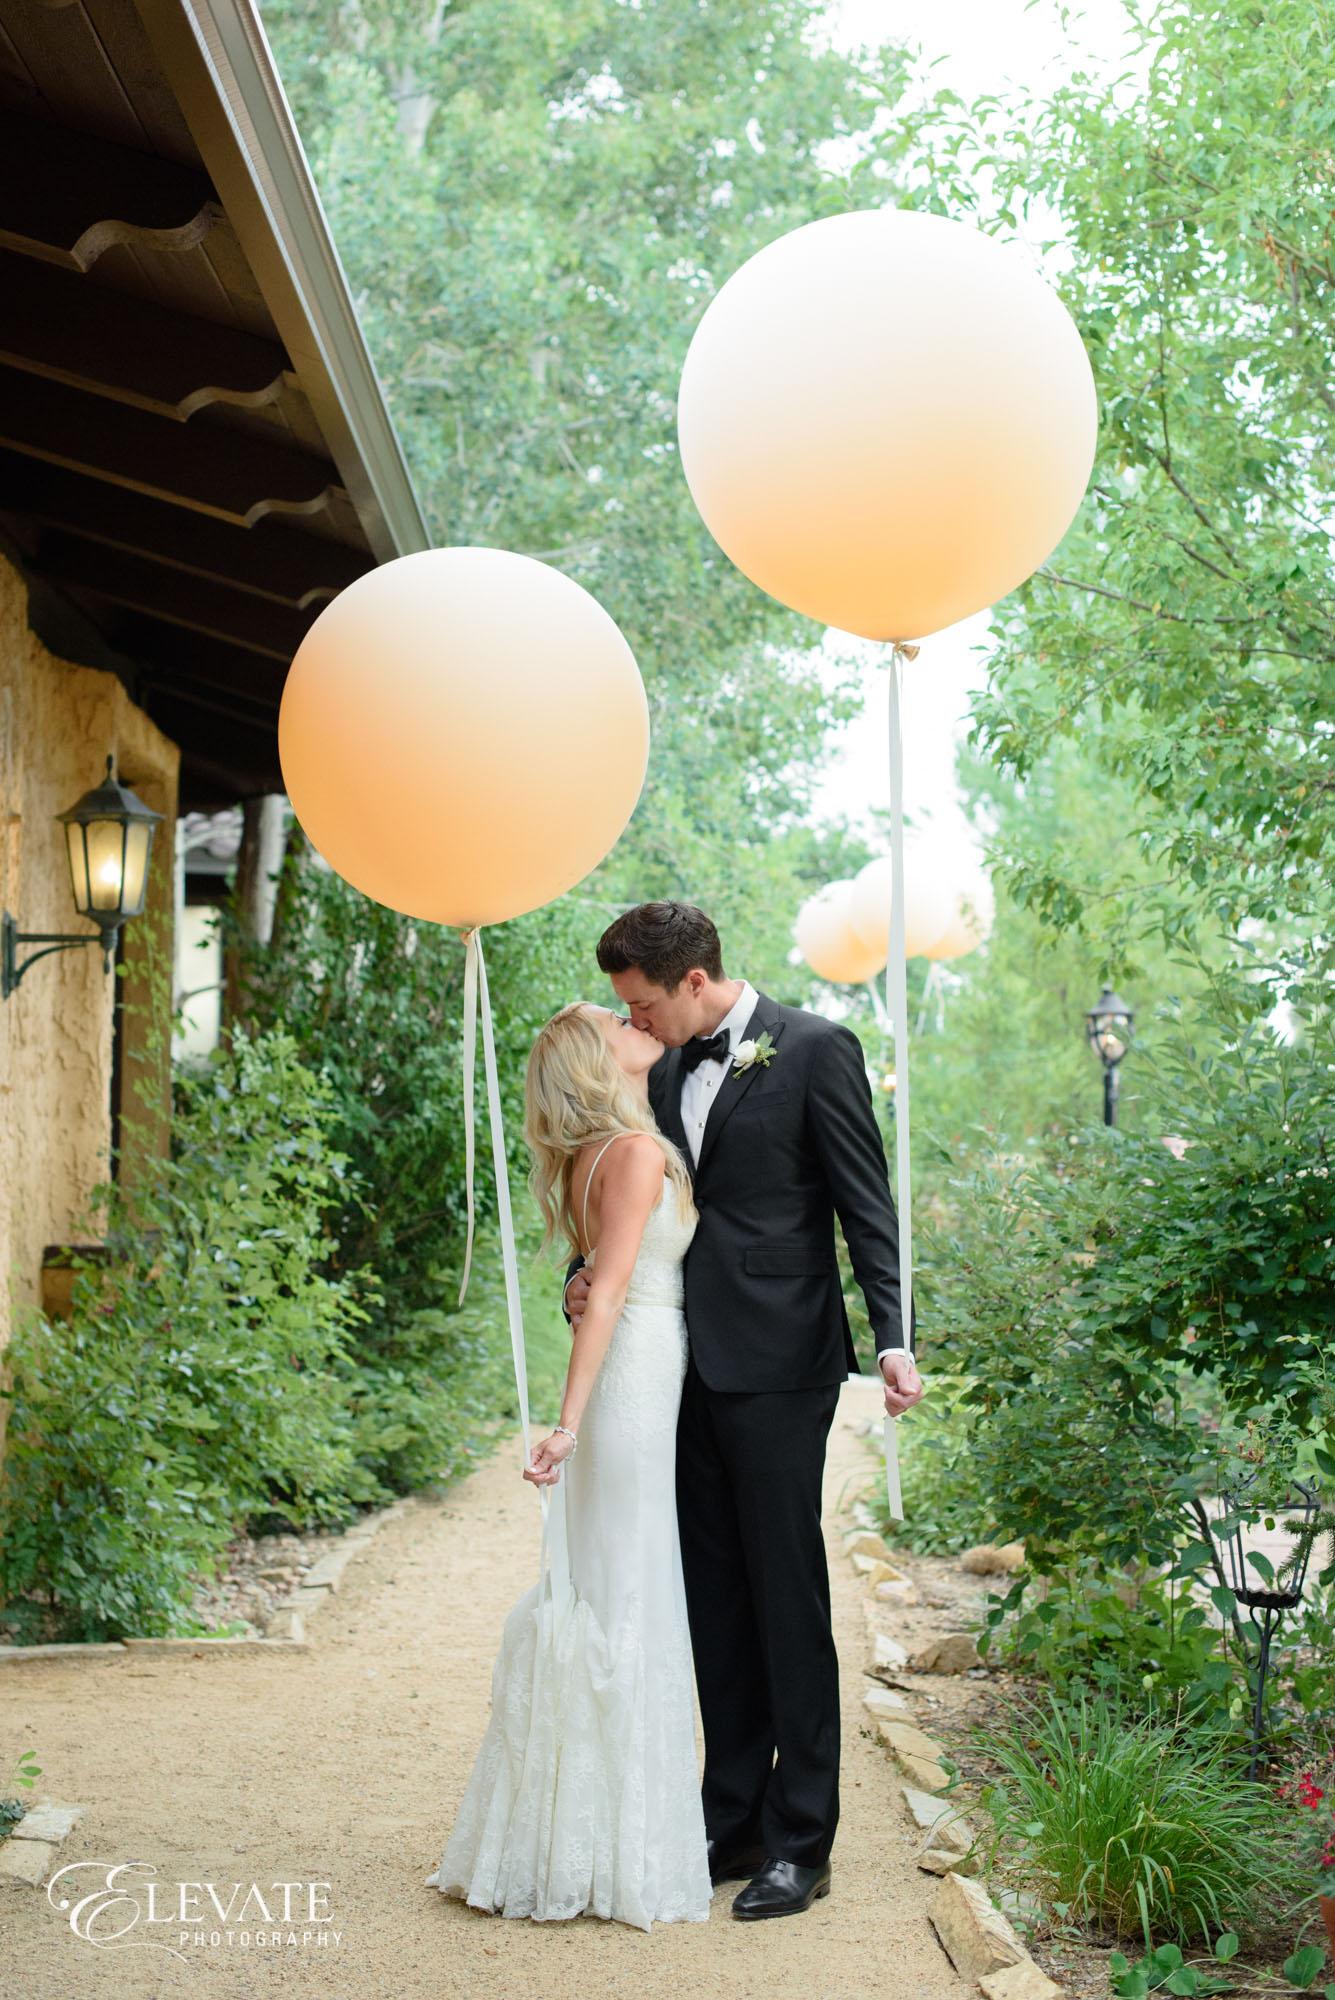 wedding balloon peach